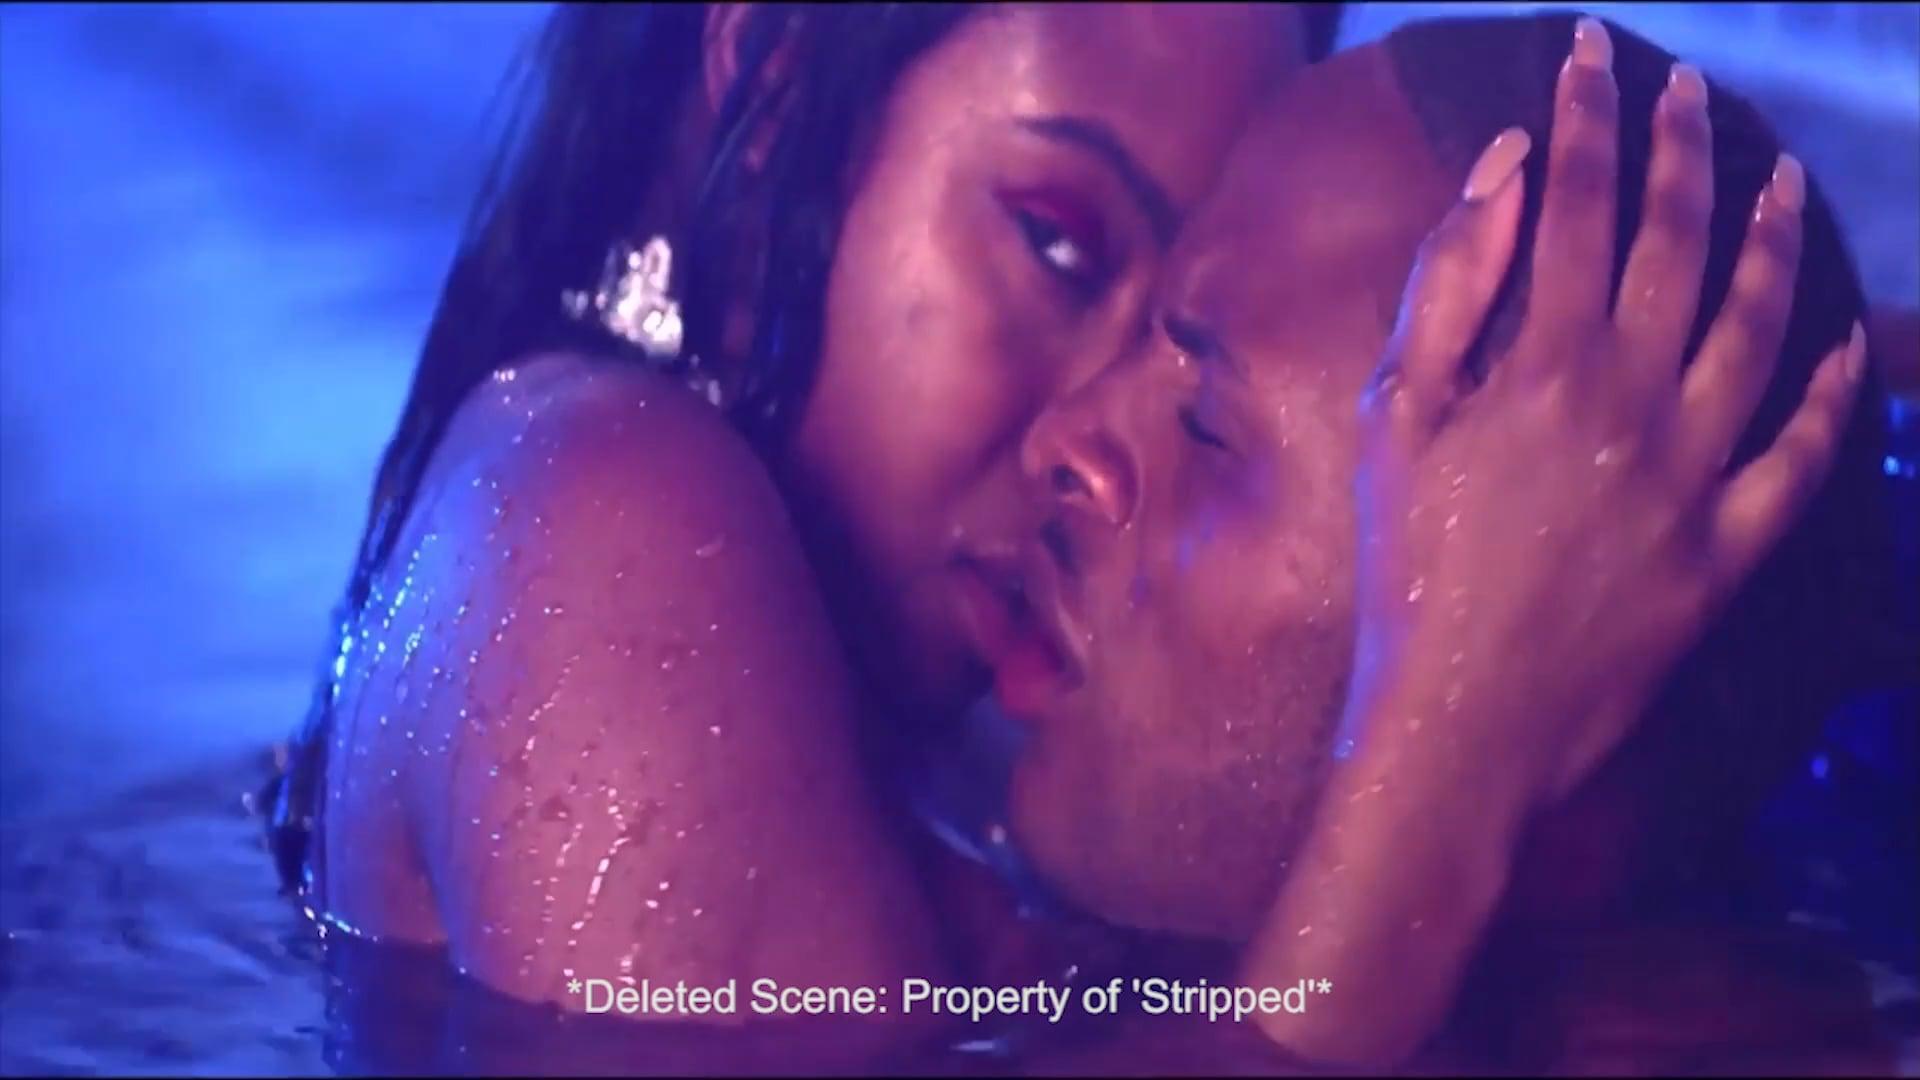 Stripped - Deleted Scene - Mz Lady Ice Does Dexta Daps Video